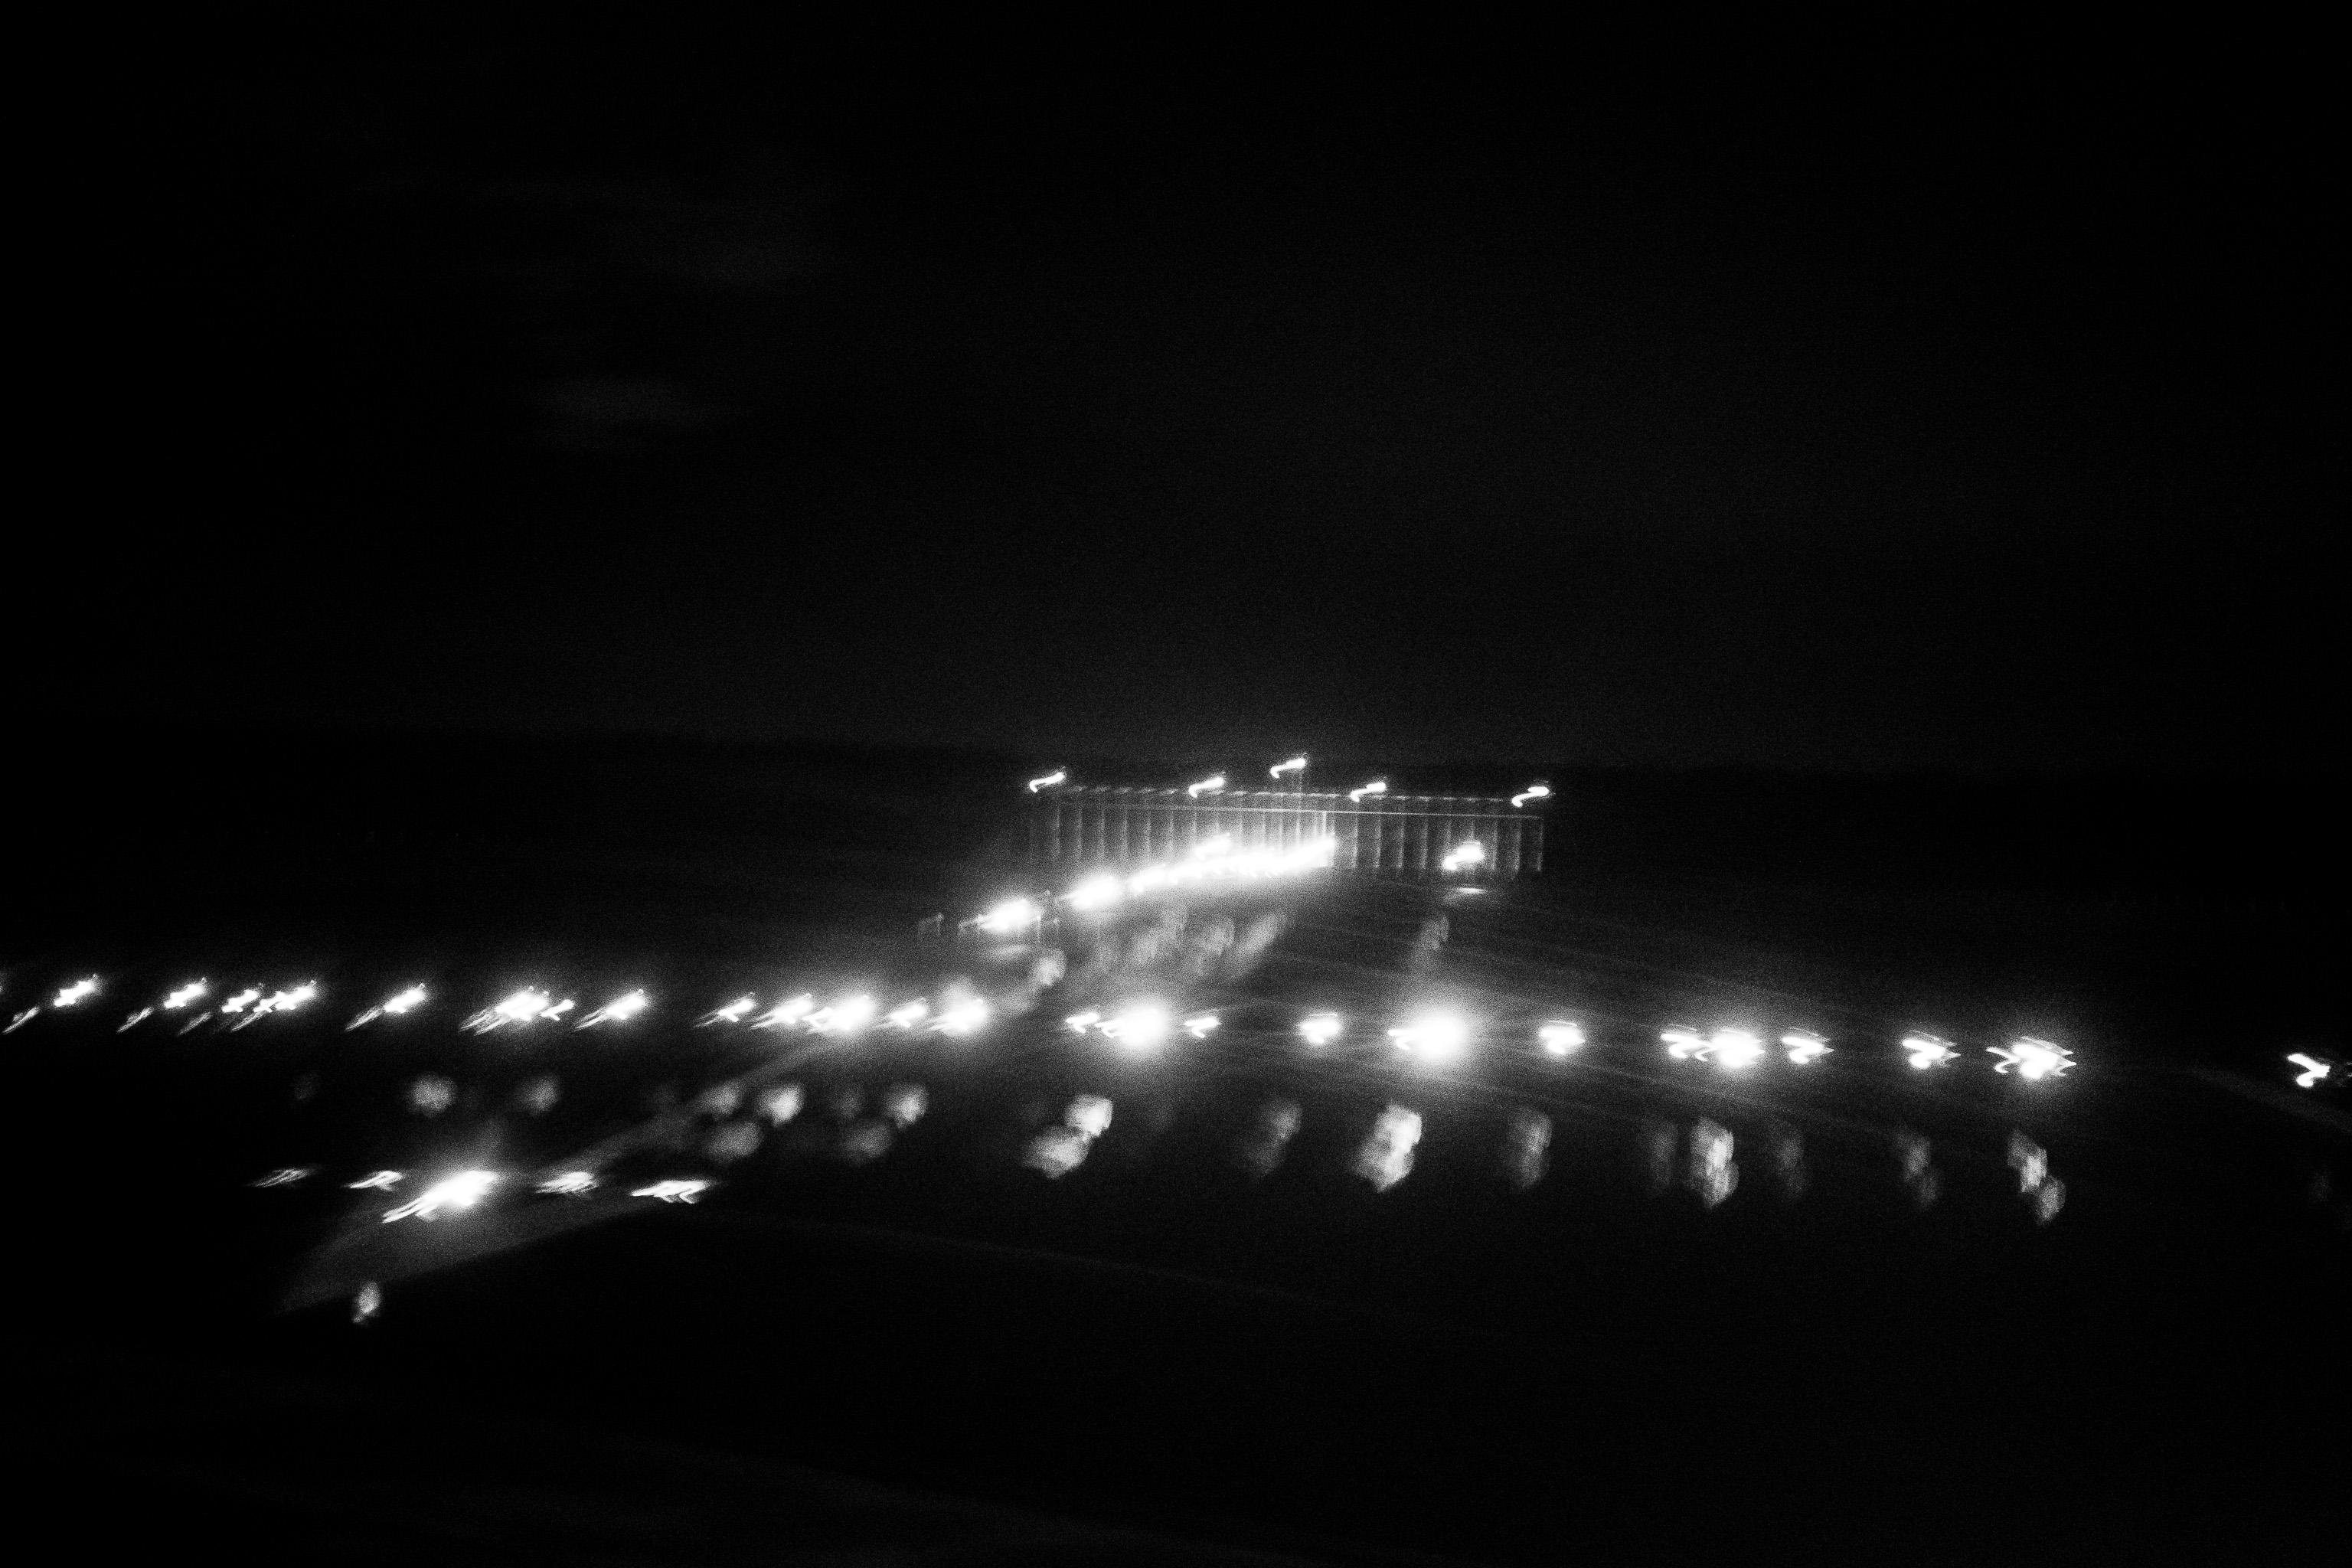 Vol de Nuit (08 von 16)